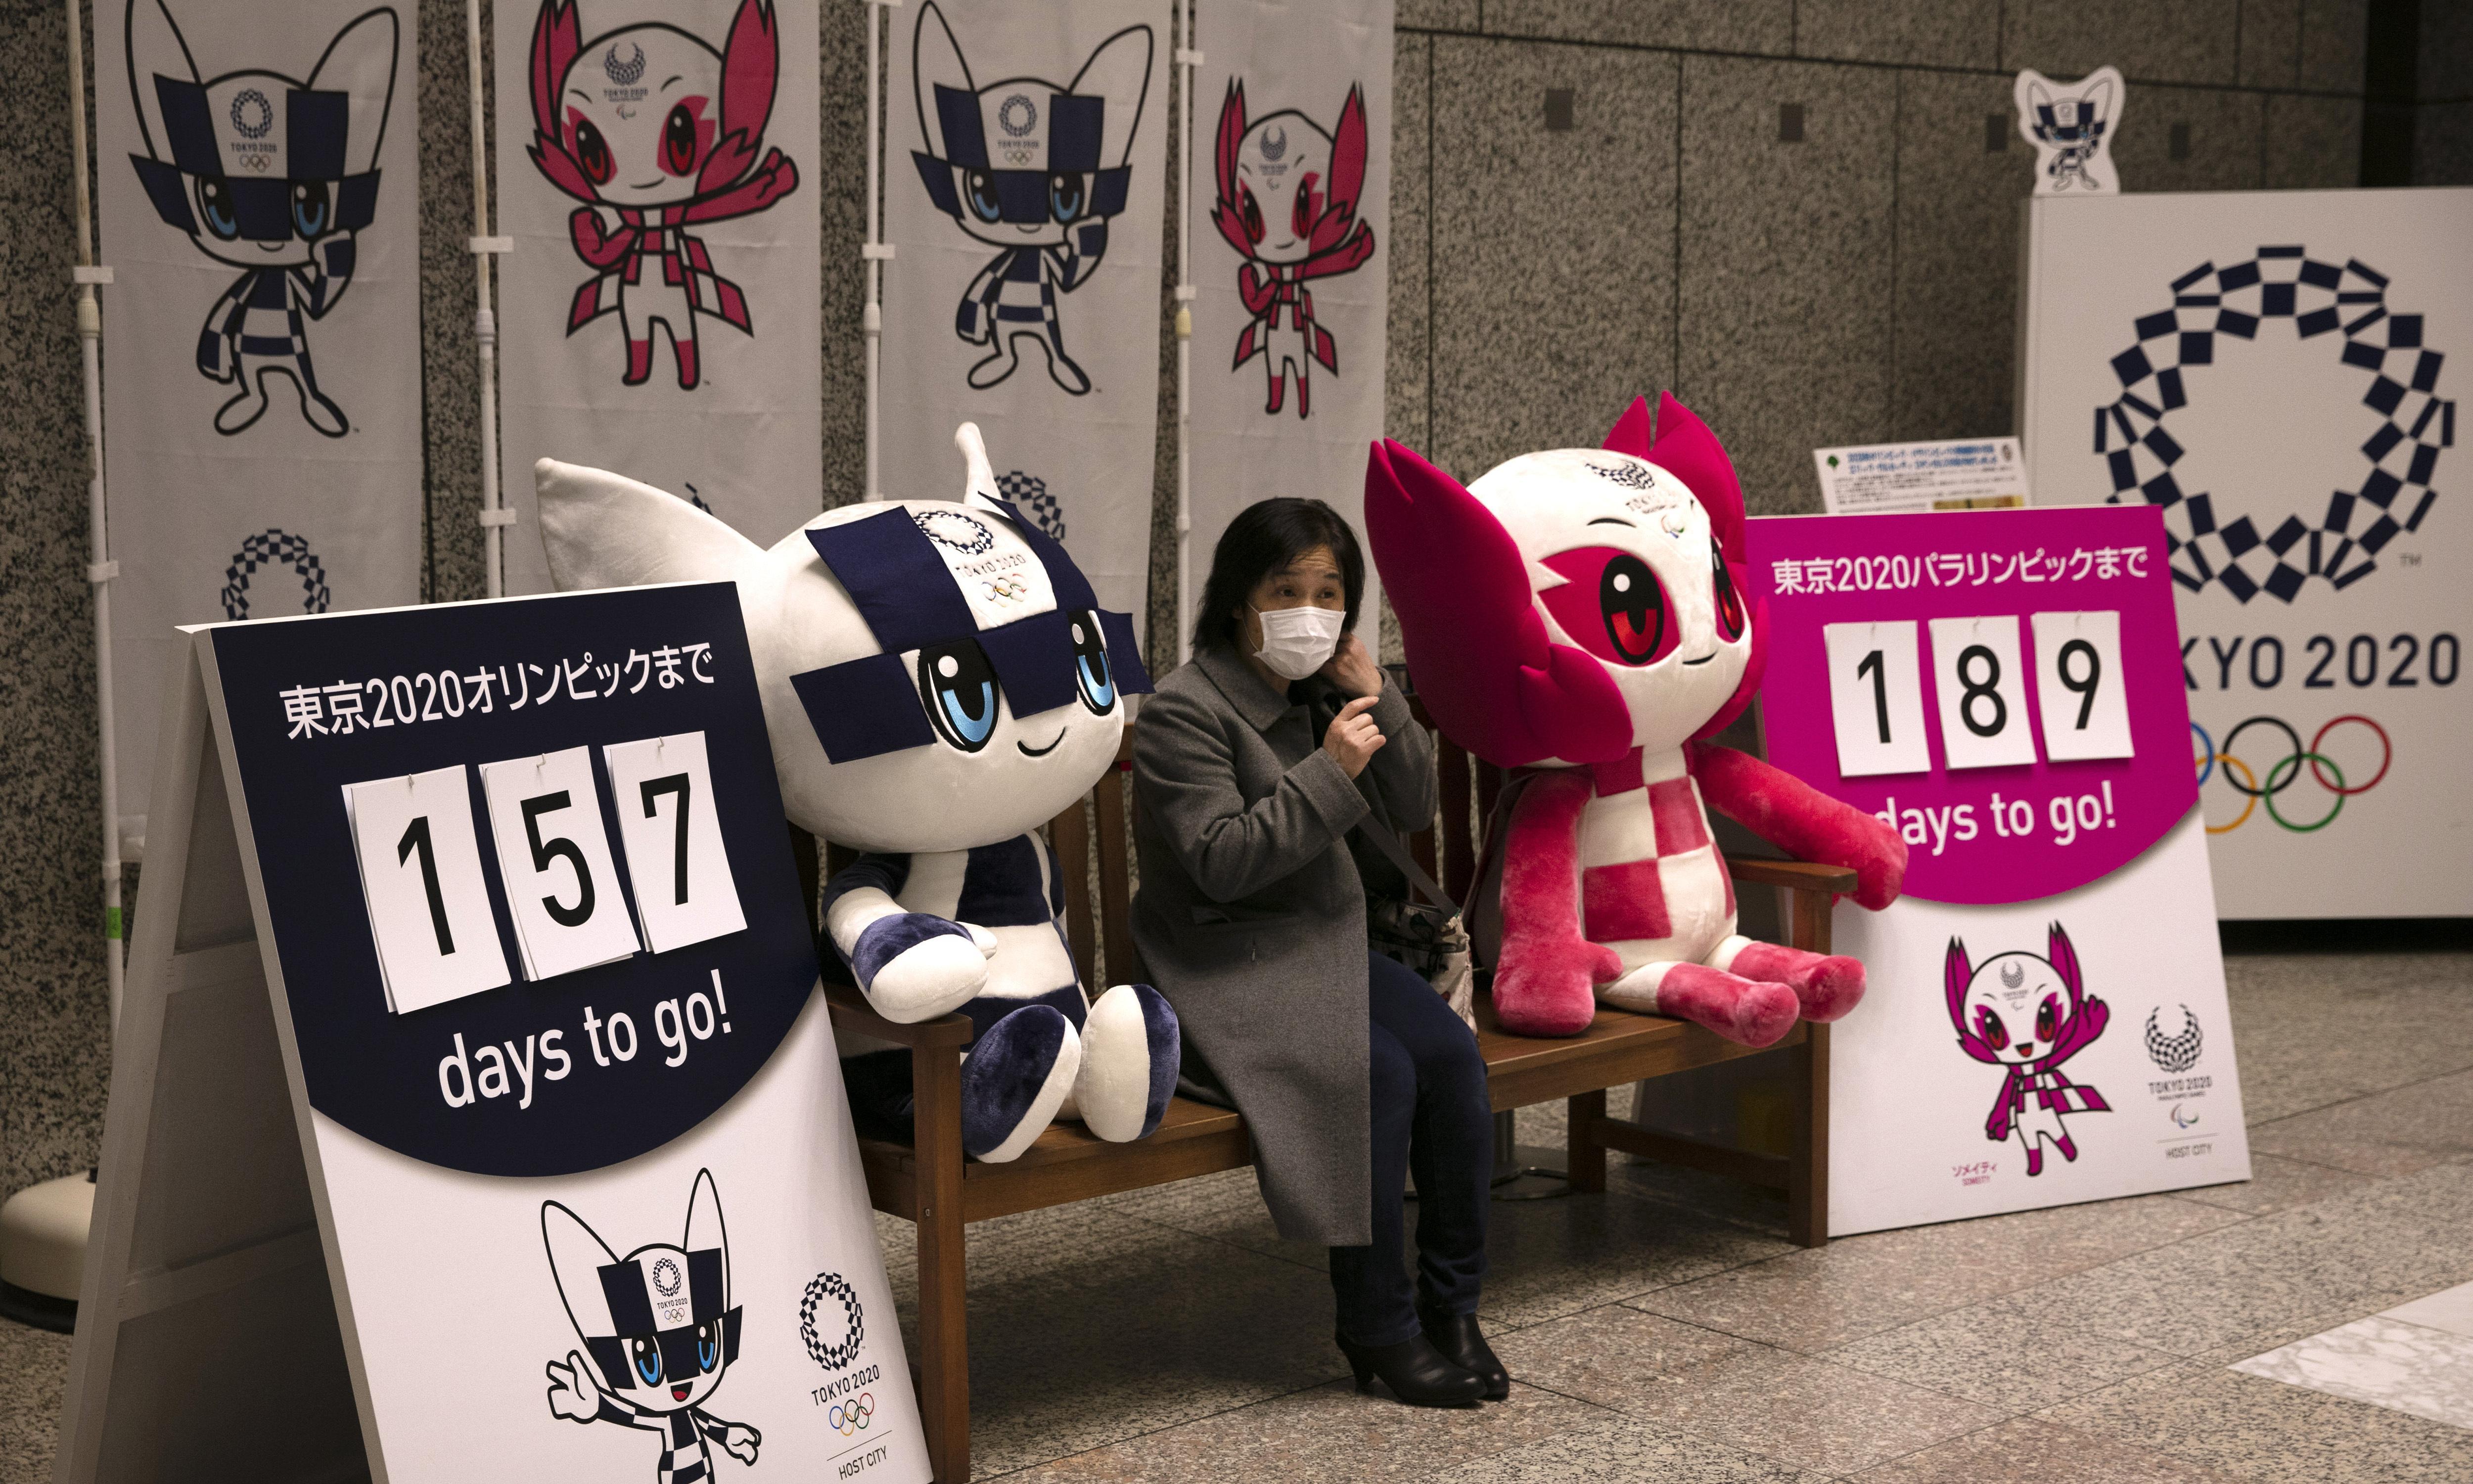 AOC 'satisfied' Tokyo Olympics will be safe from coronavirus